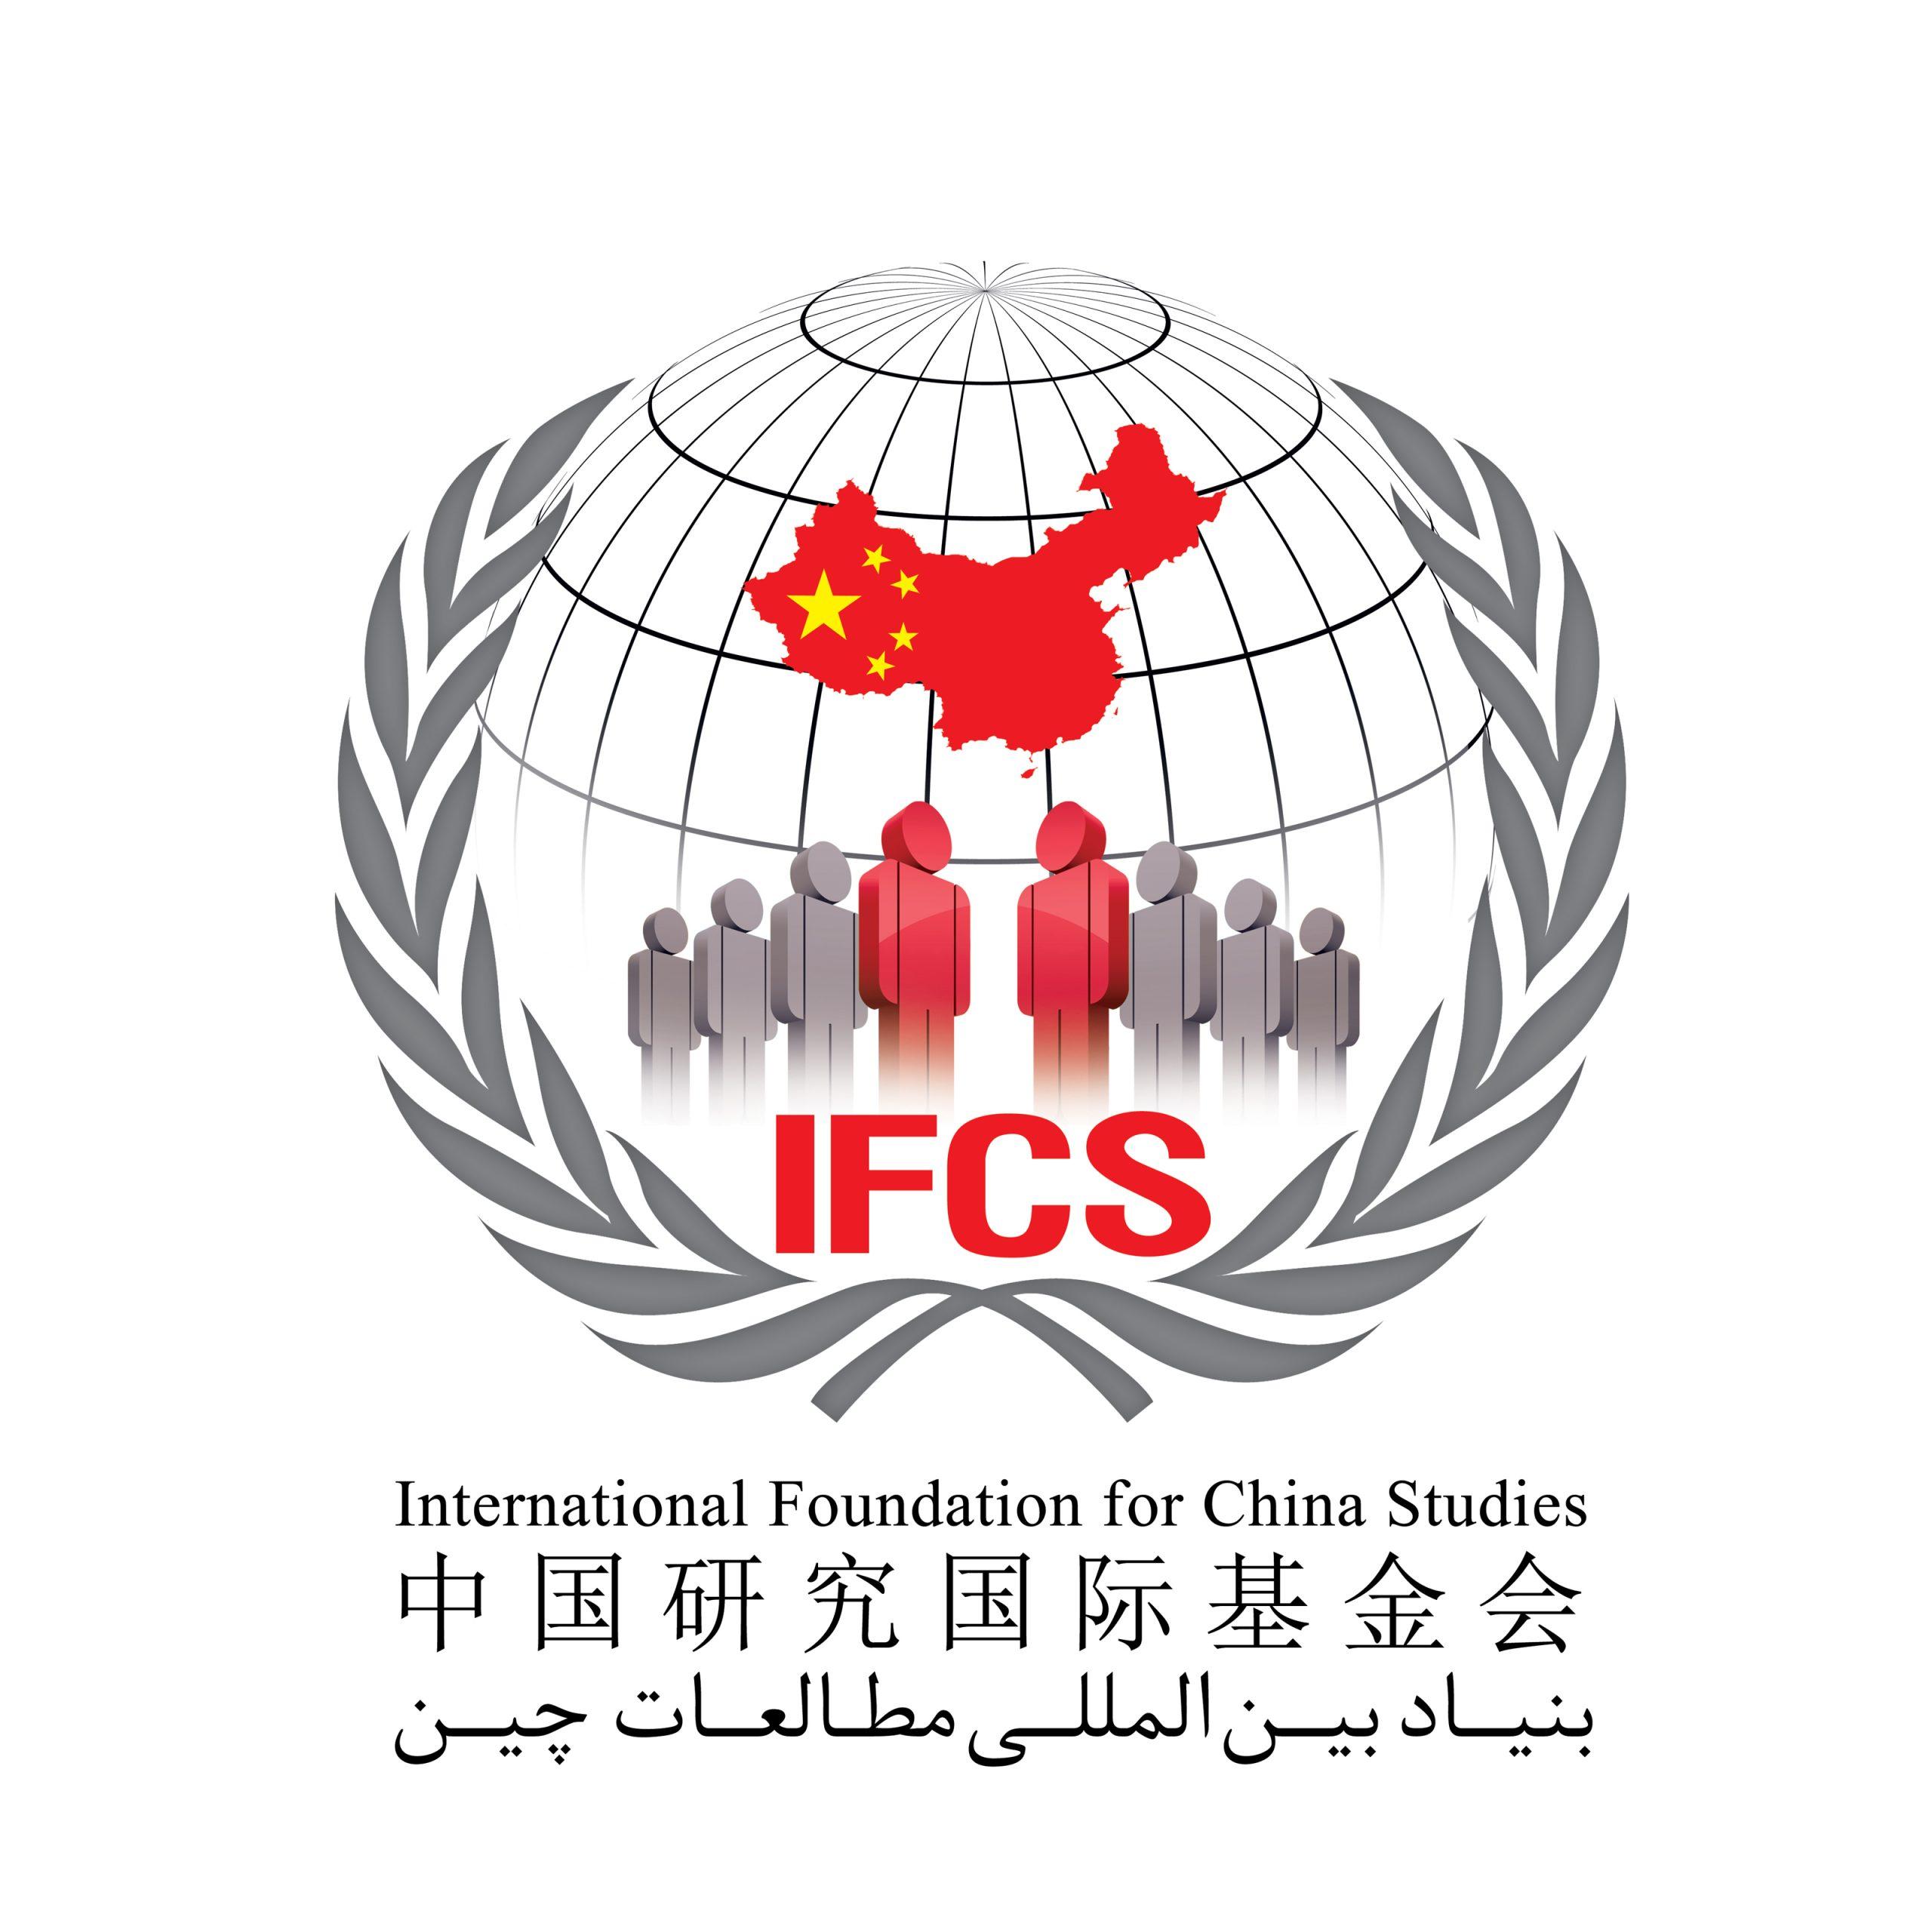 پرتال جامع بنیاد چین